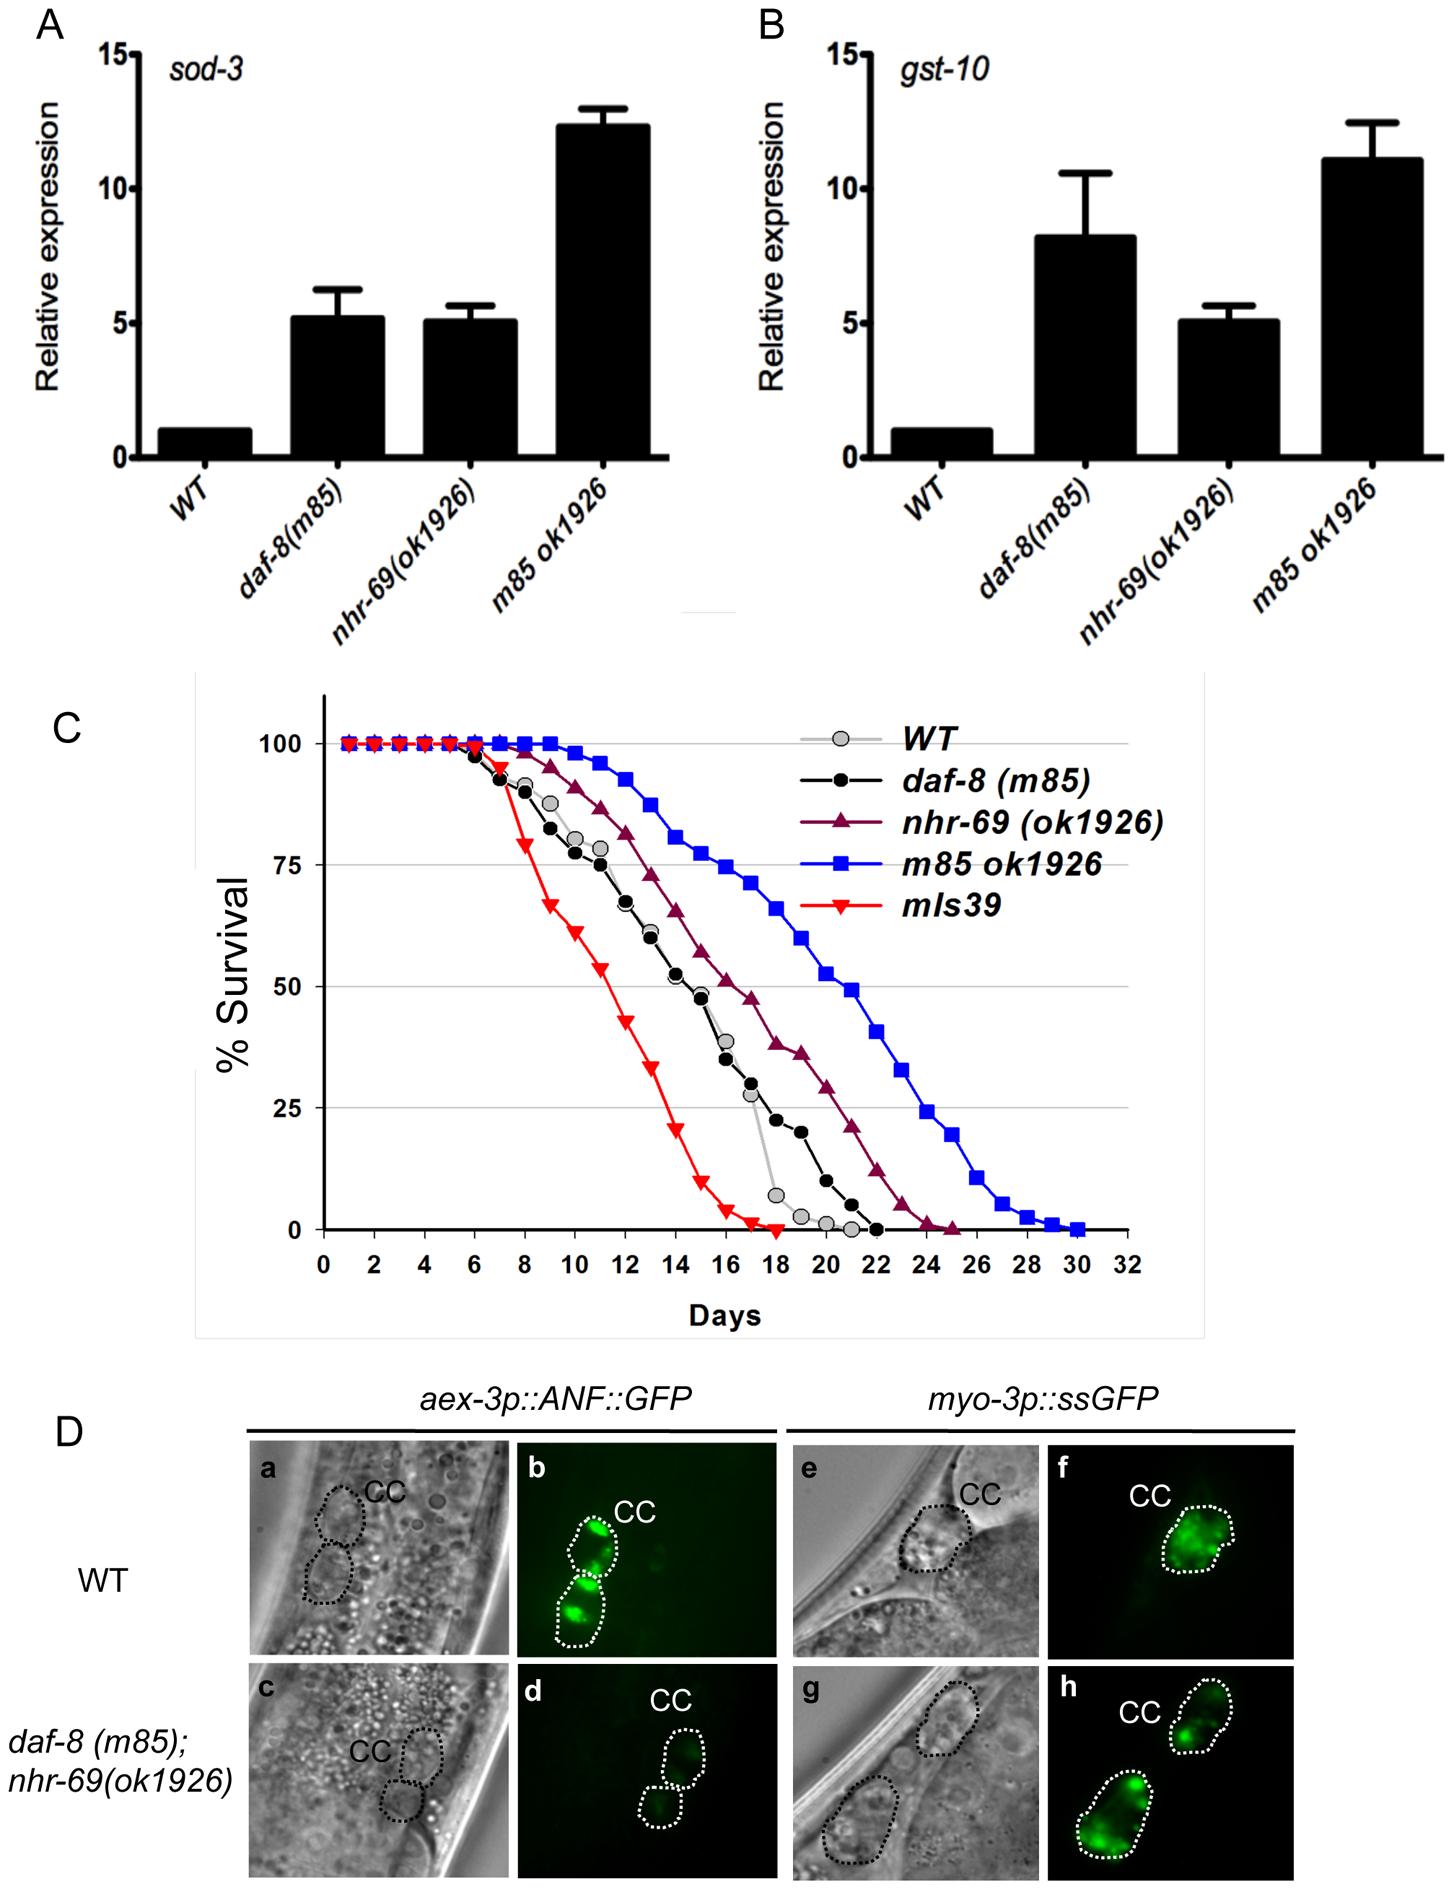 Reduced insulin signaling and neuropeptide secretion in <i>daf-8 nhr-69</i> mutants.